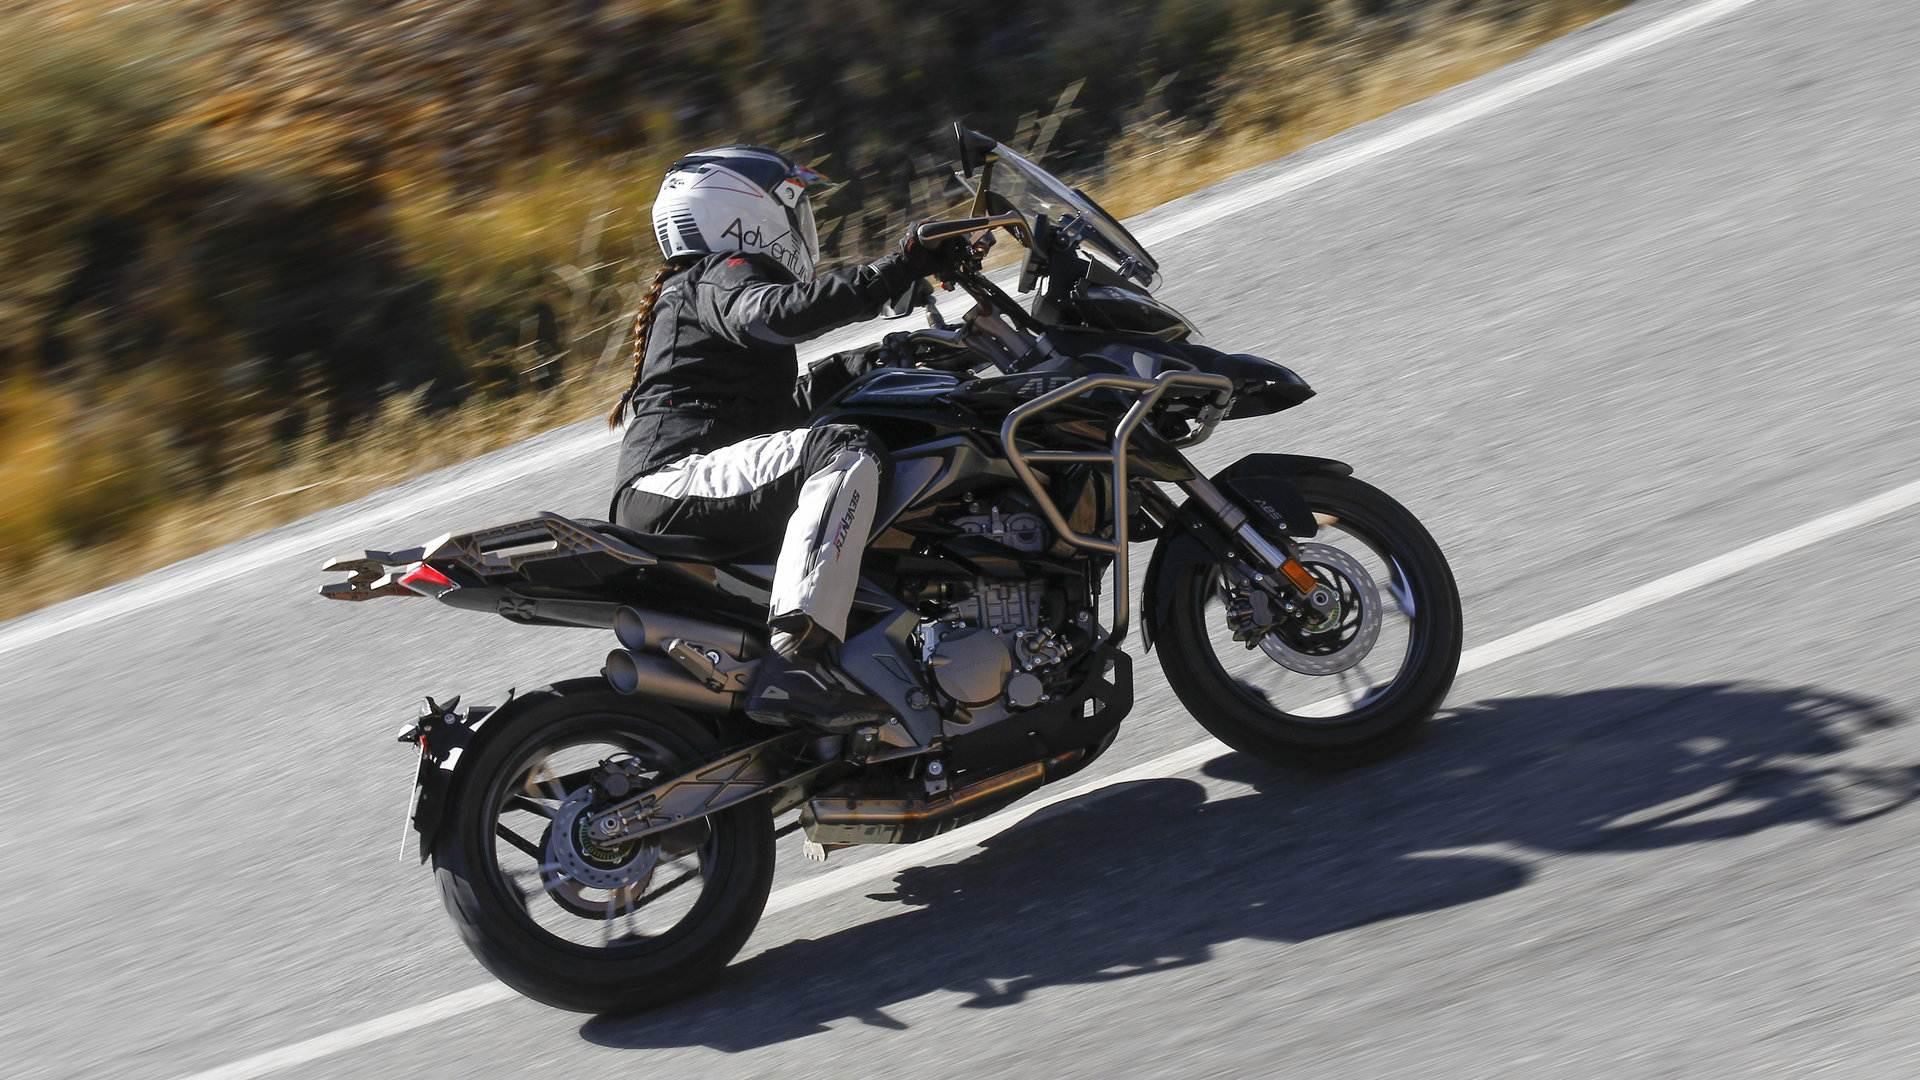 La Zontes T-310 llega a España, una trail de menos de 4.500 euros